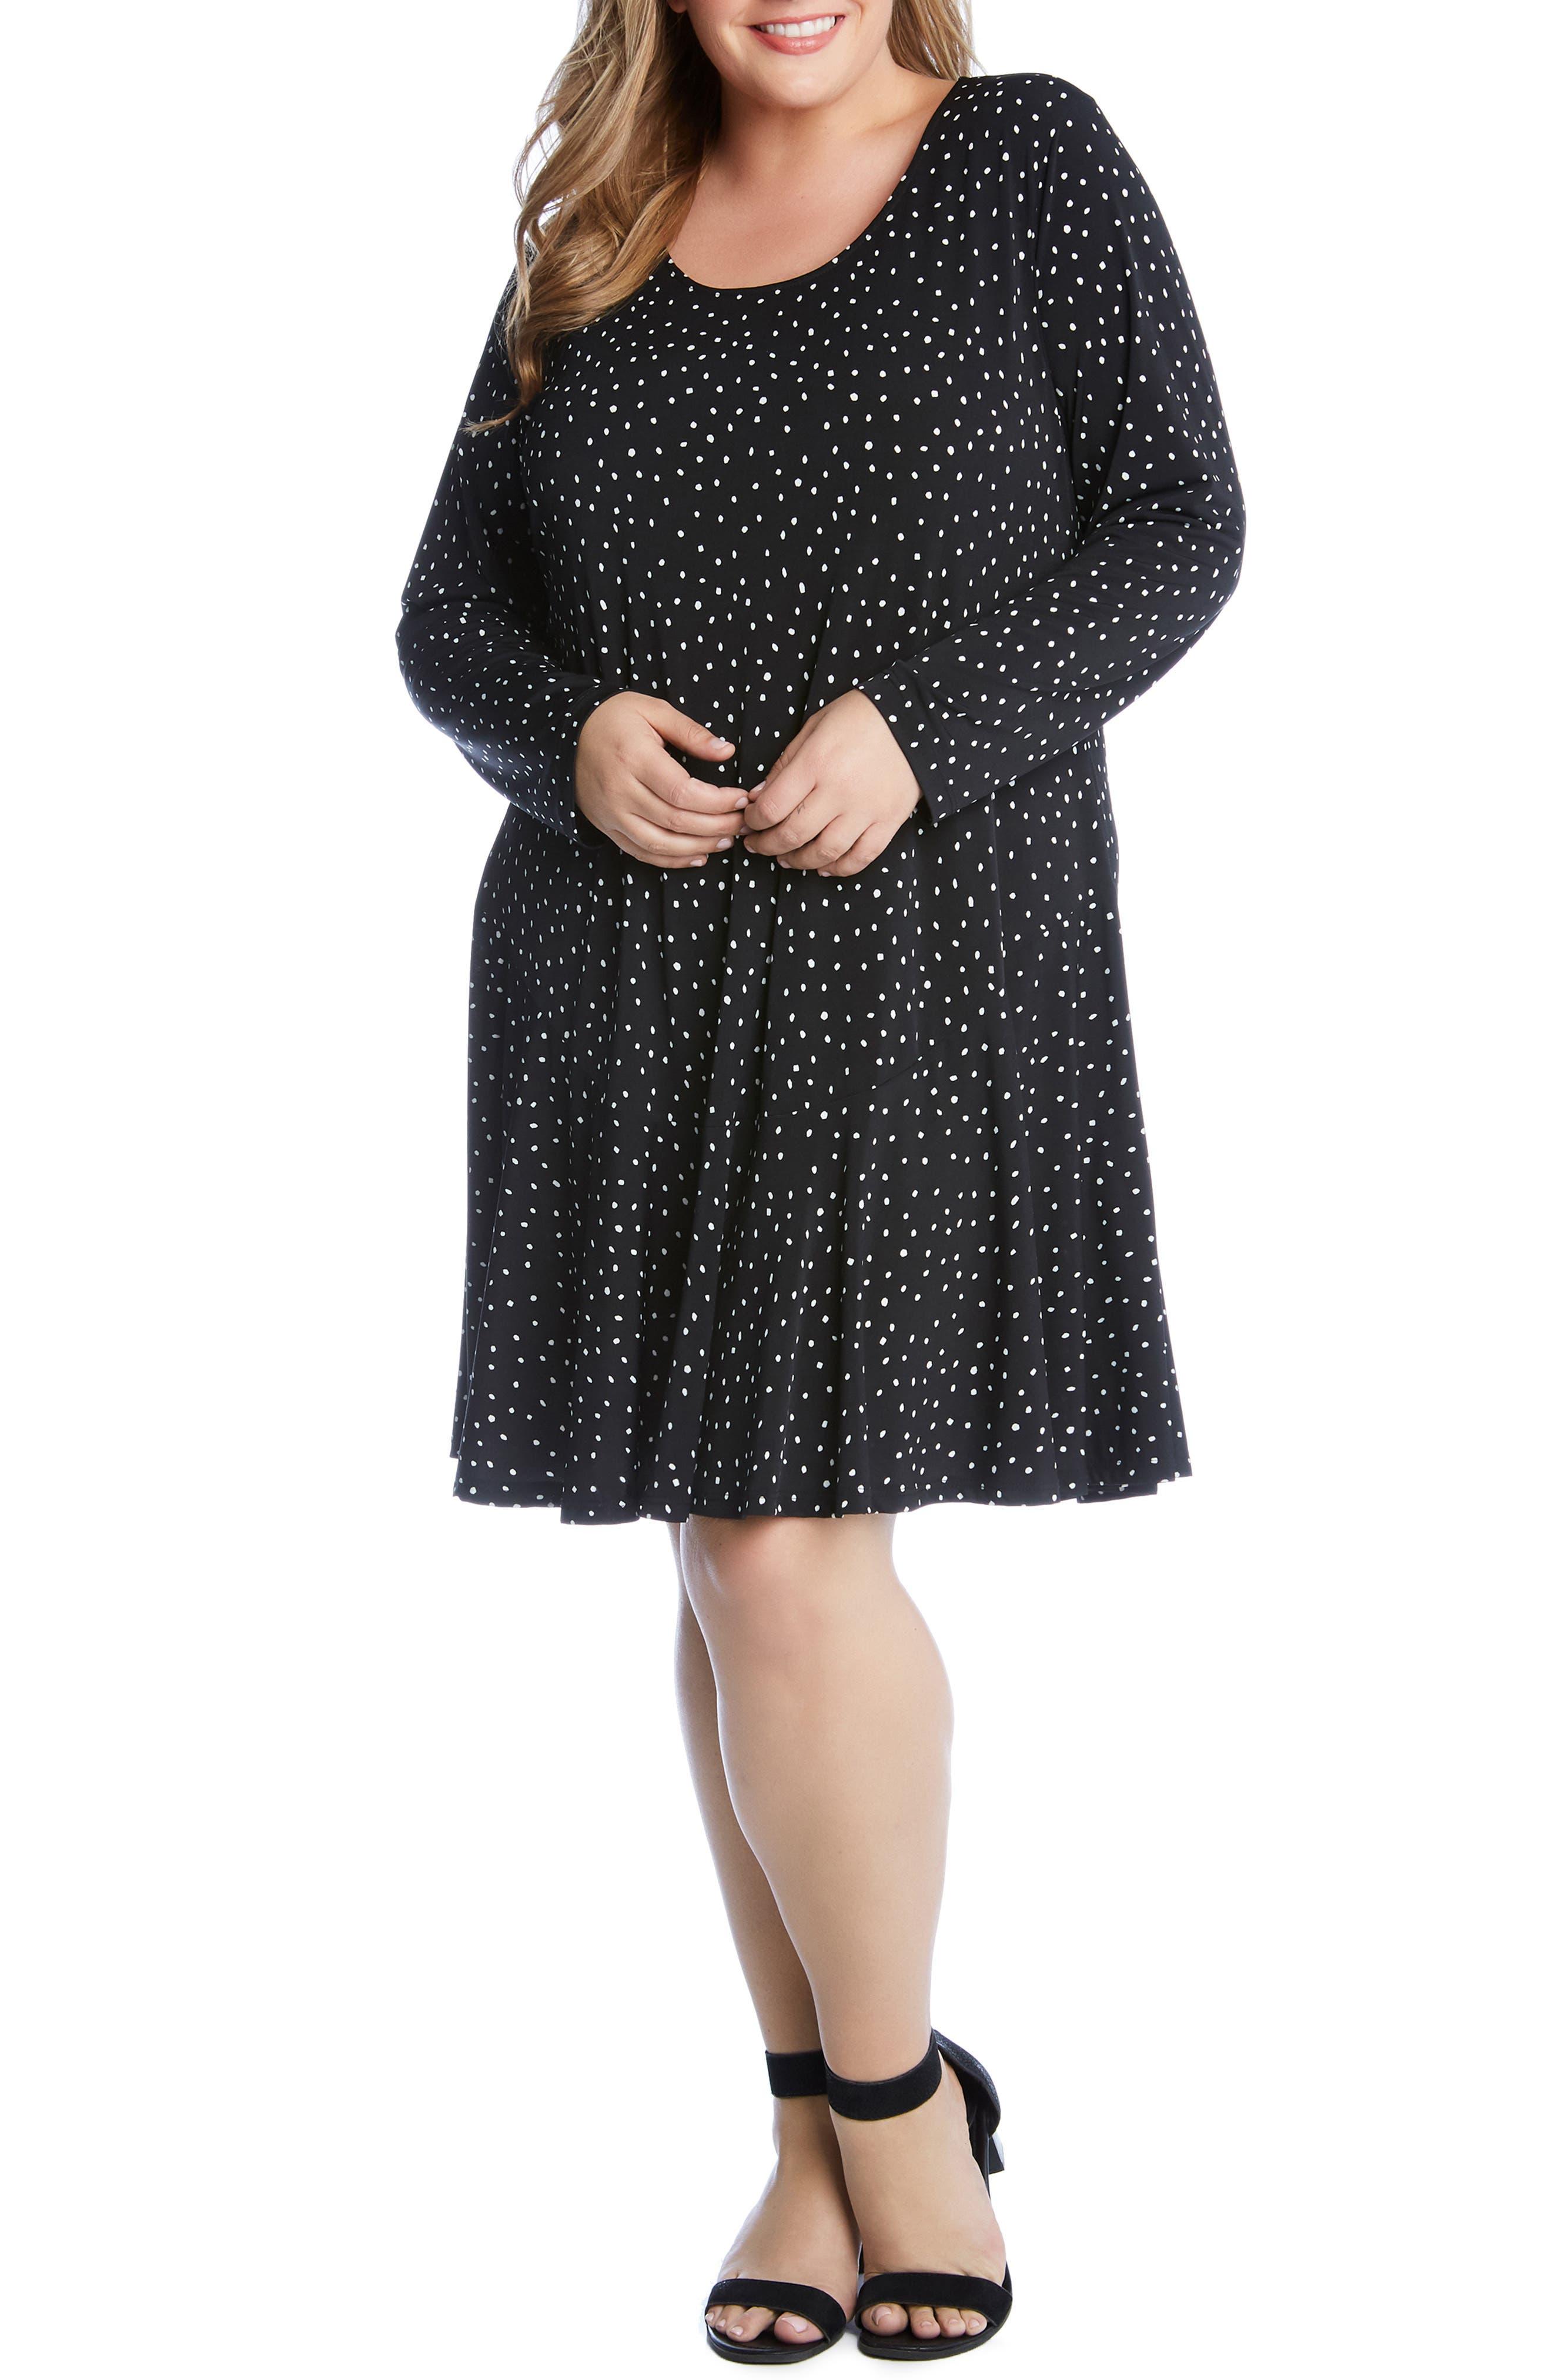 KAREN KANE, Dakota Dot Jersey A-Line Dress, Main thumbnail 1, color, DOT